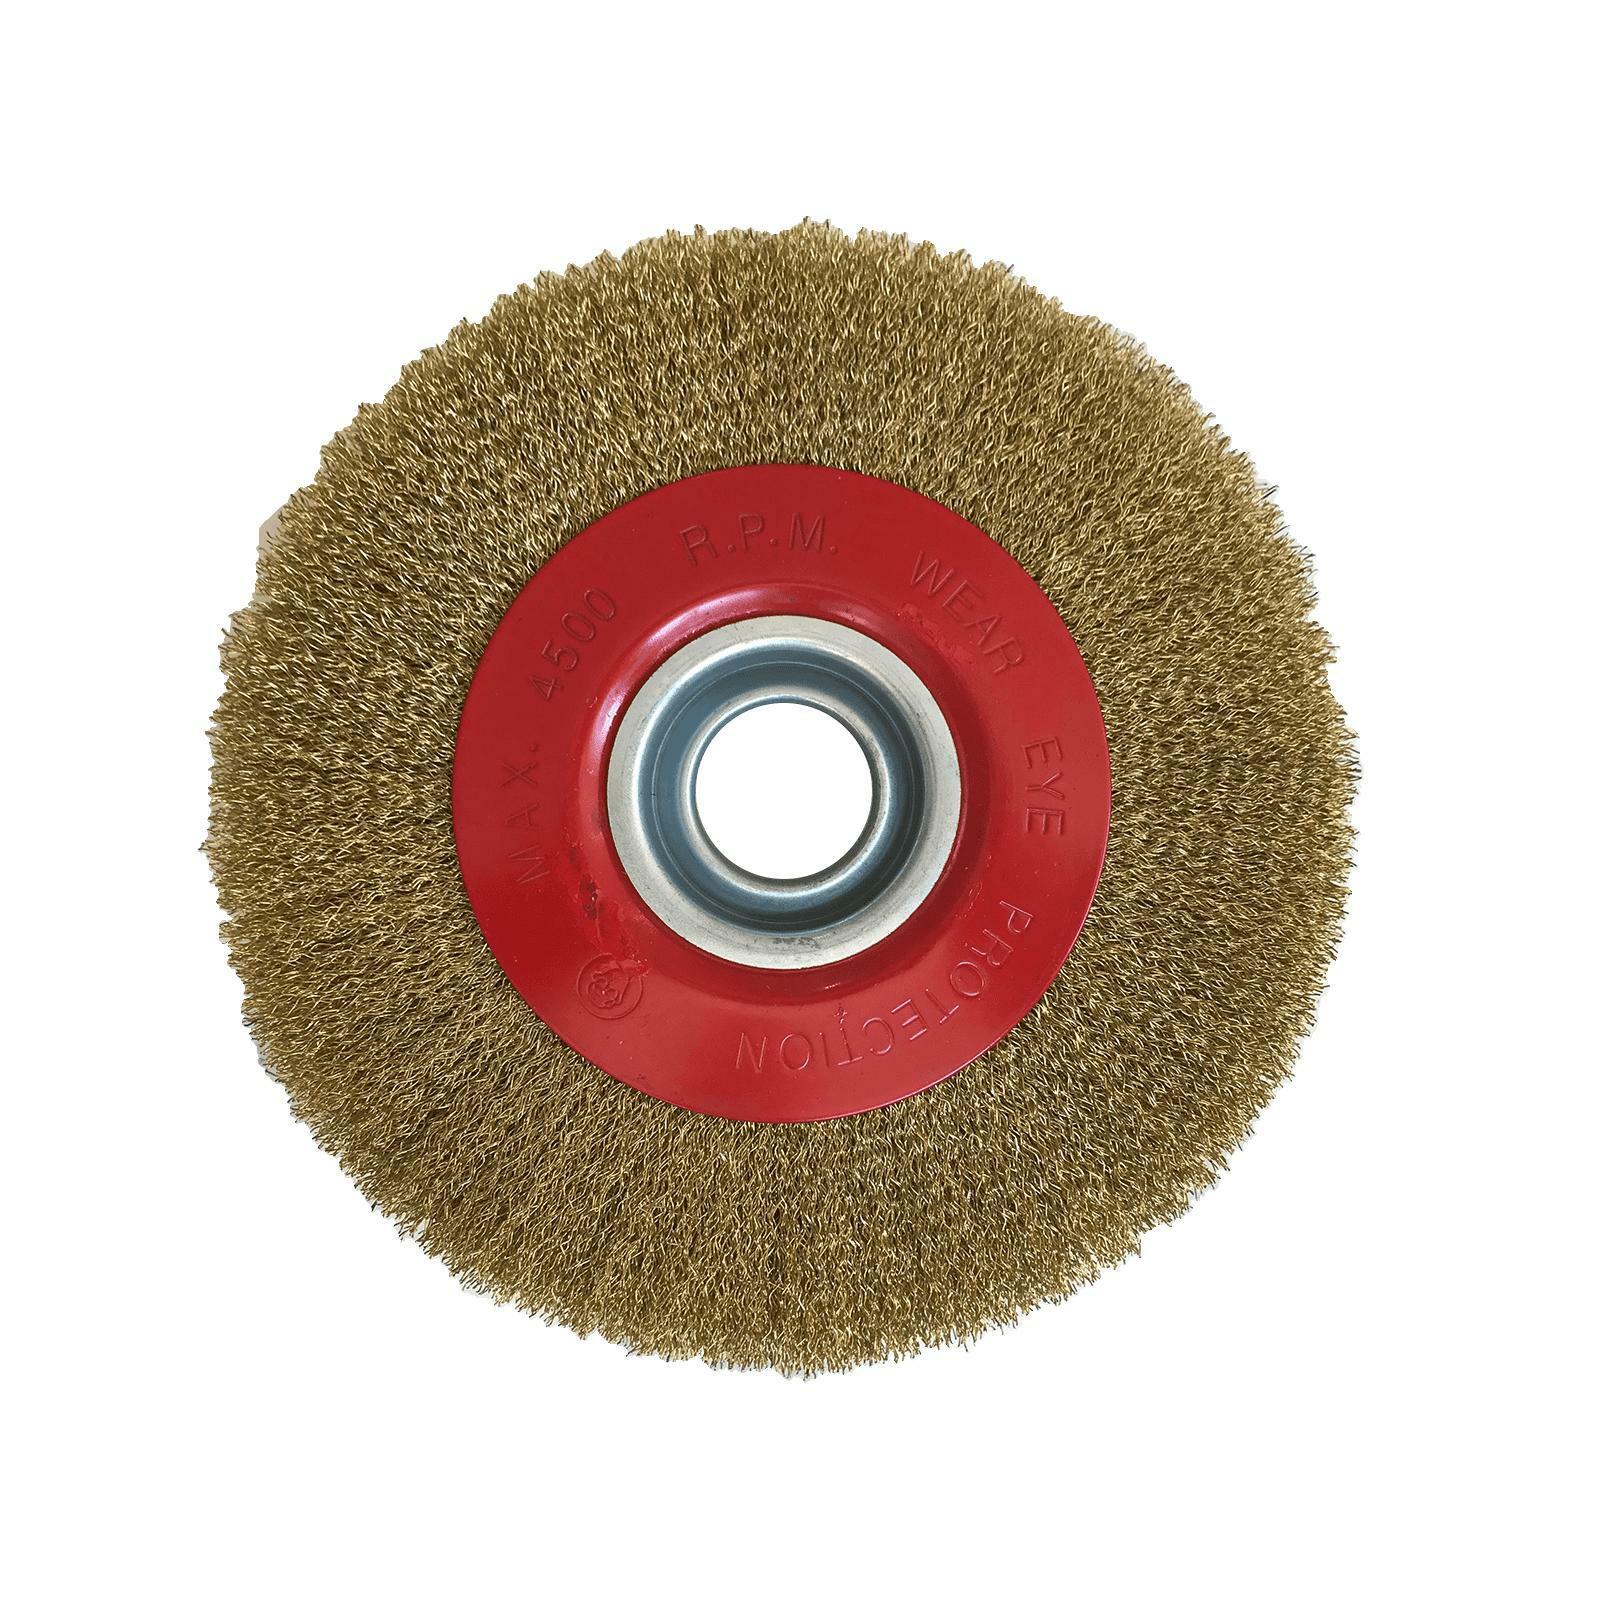 valex spazzola pulitrice in ottone diametro 200mm per mola valex